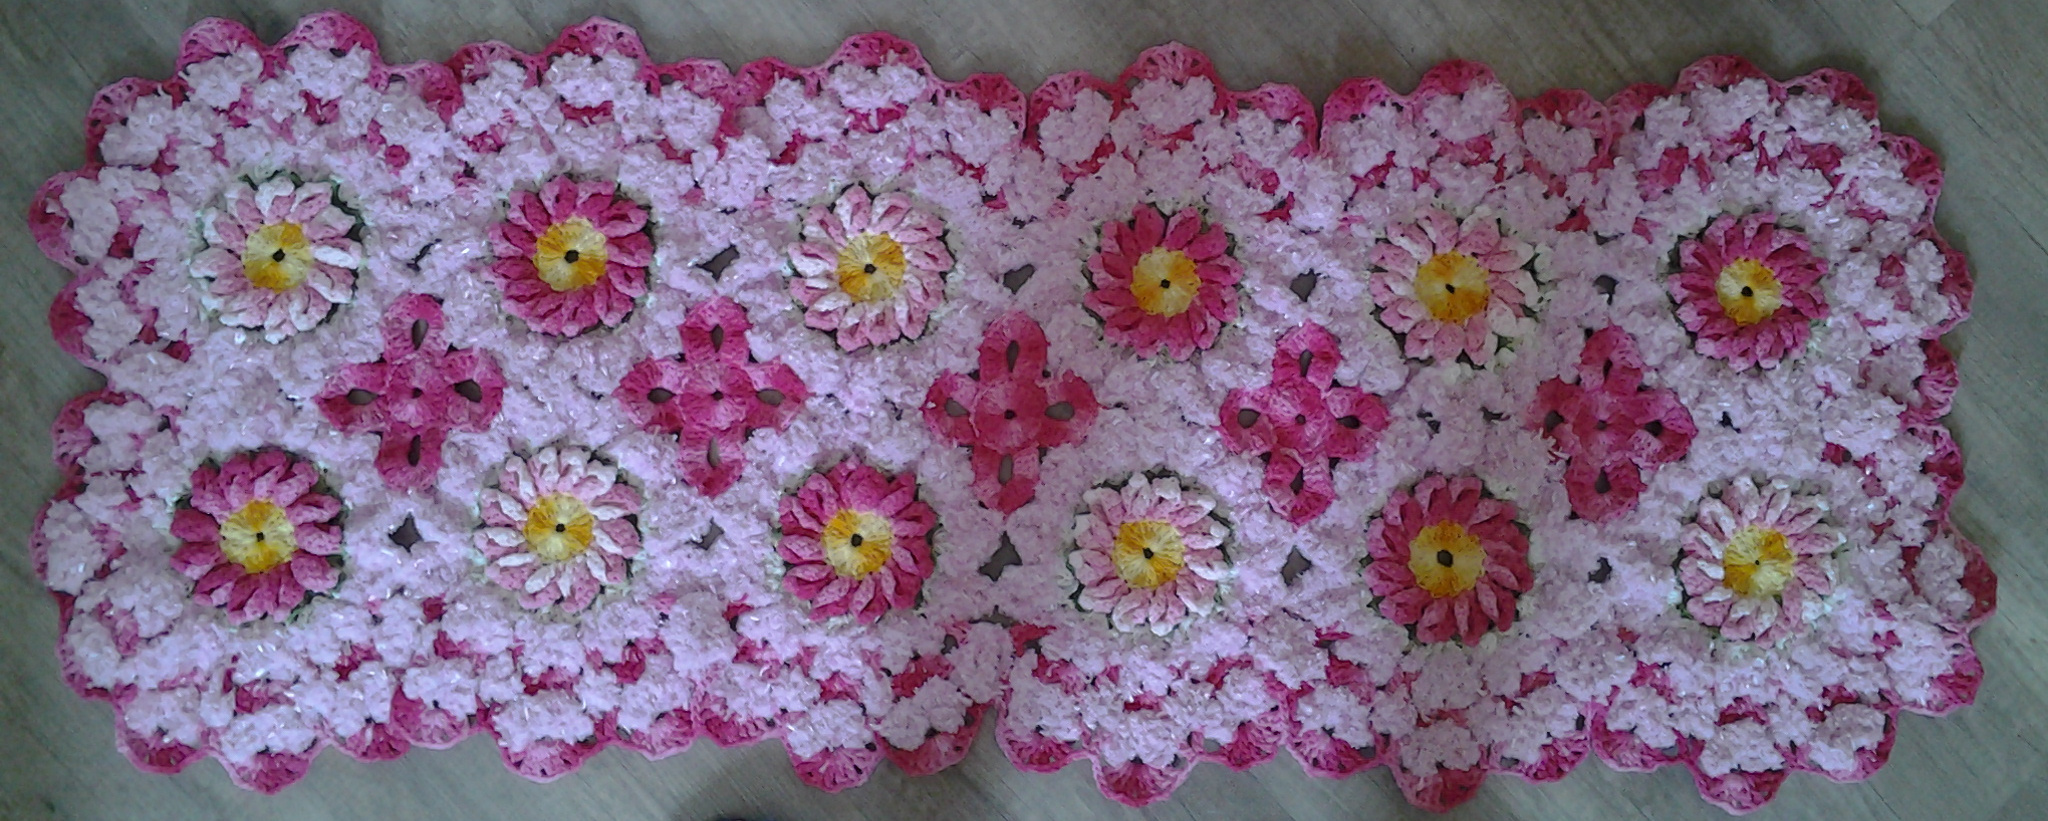 1000 images about ideas in crochet on pinterest for Tapetes de crochet